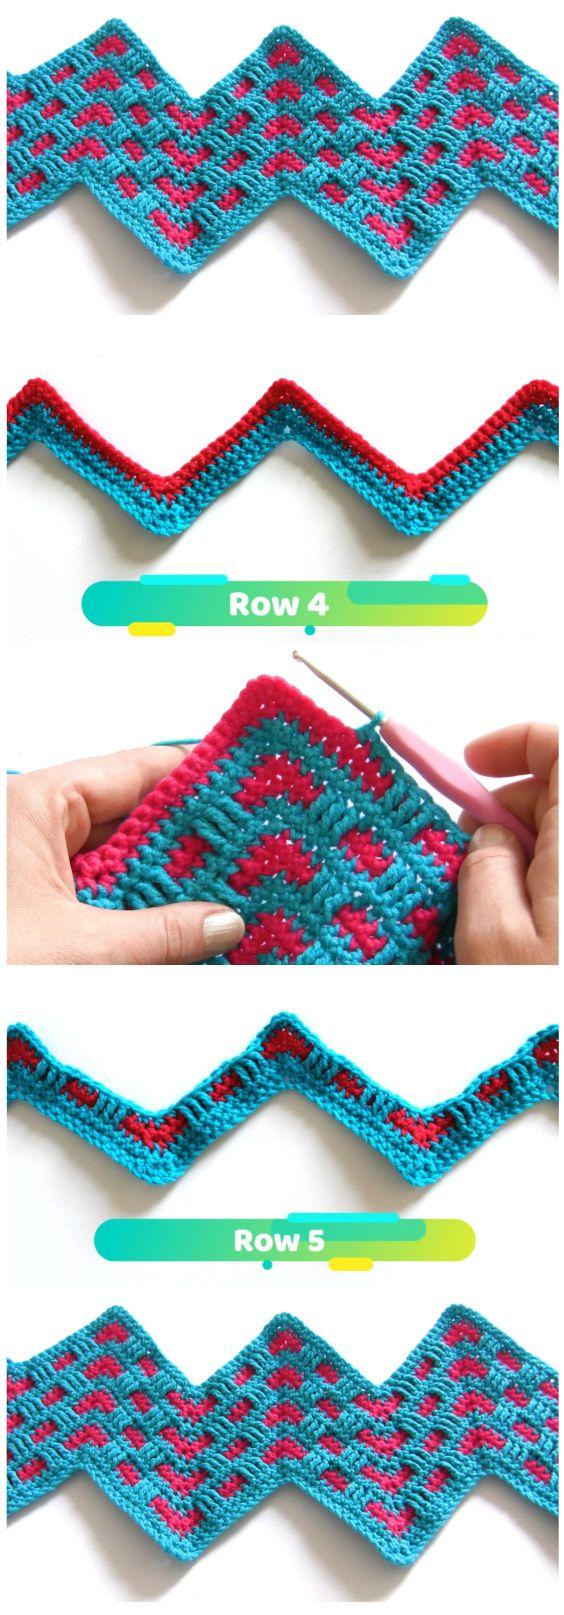 Crochet Mosaic Ripple Stitch